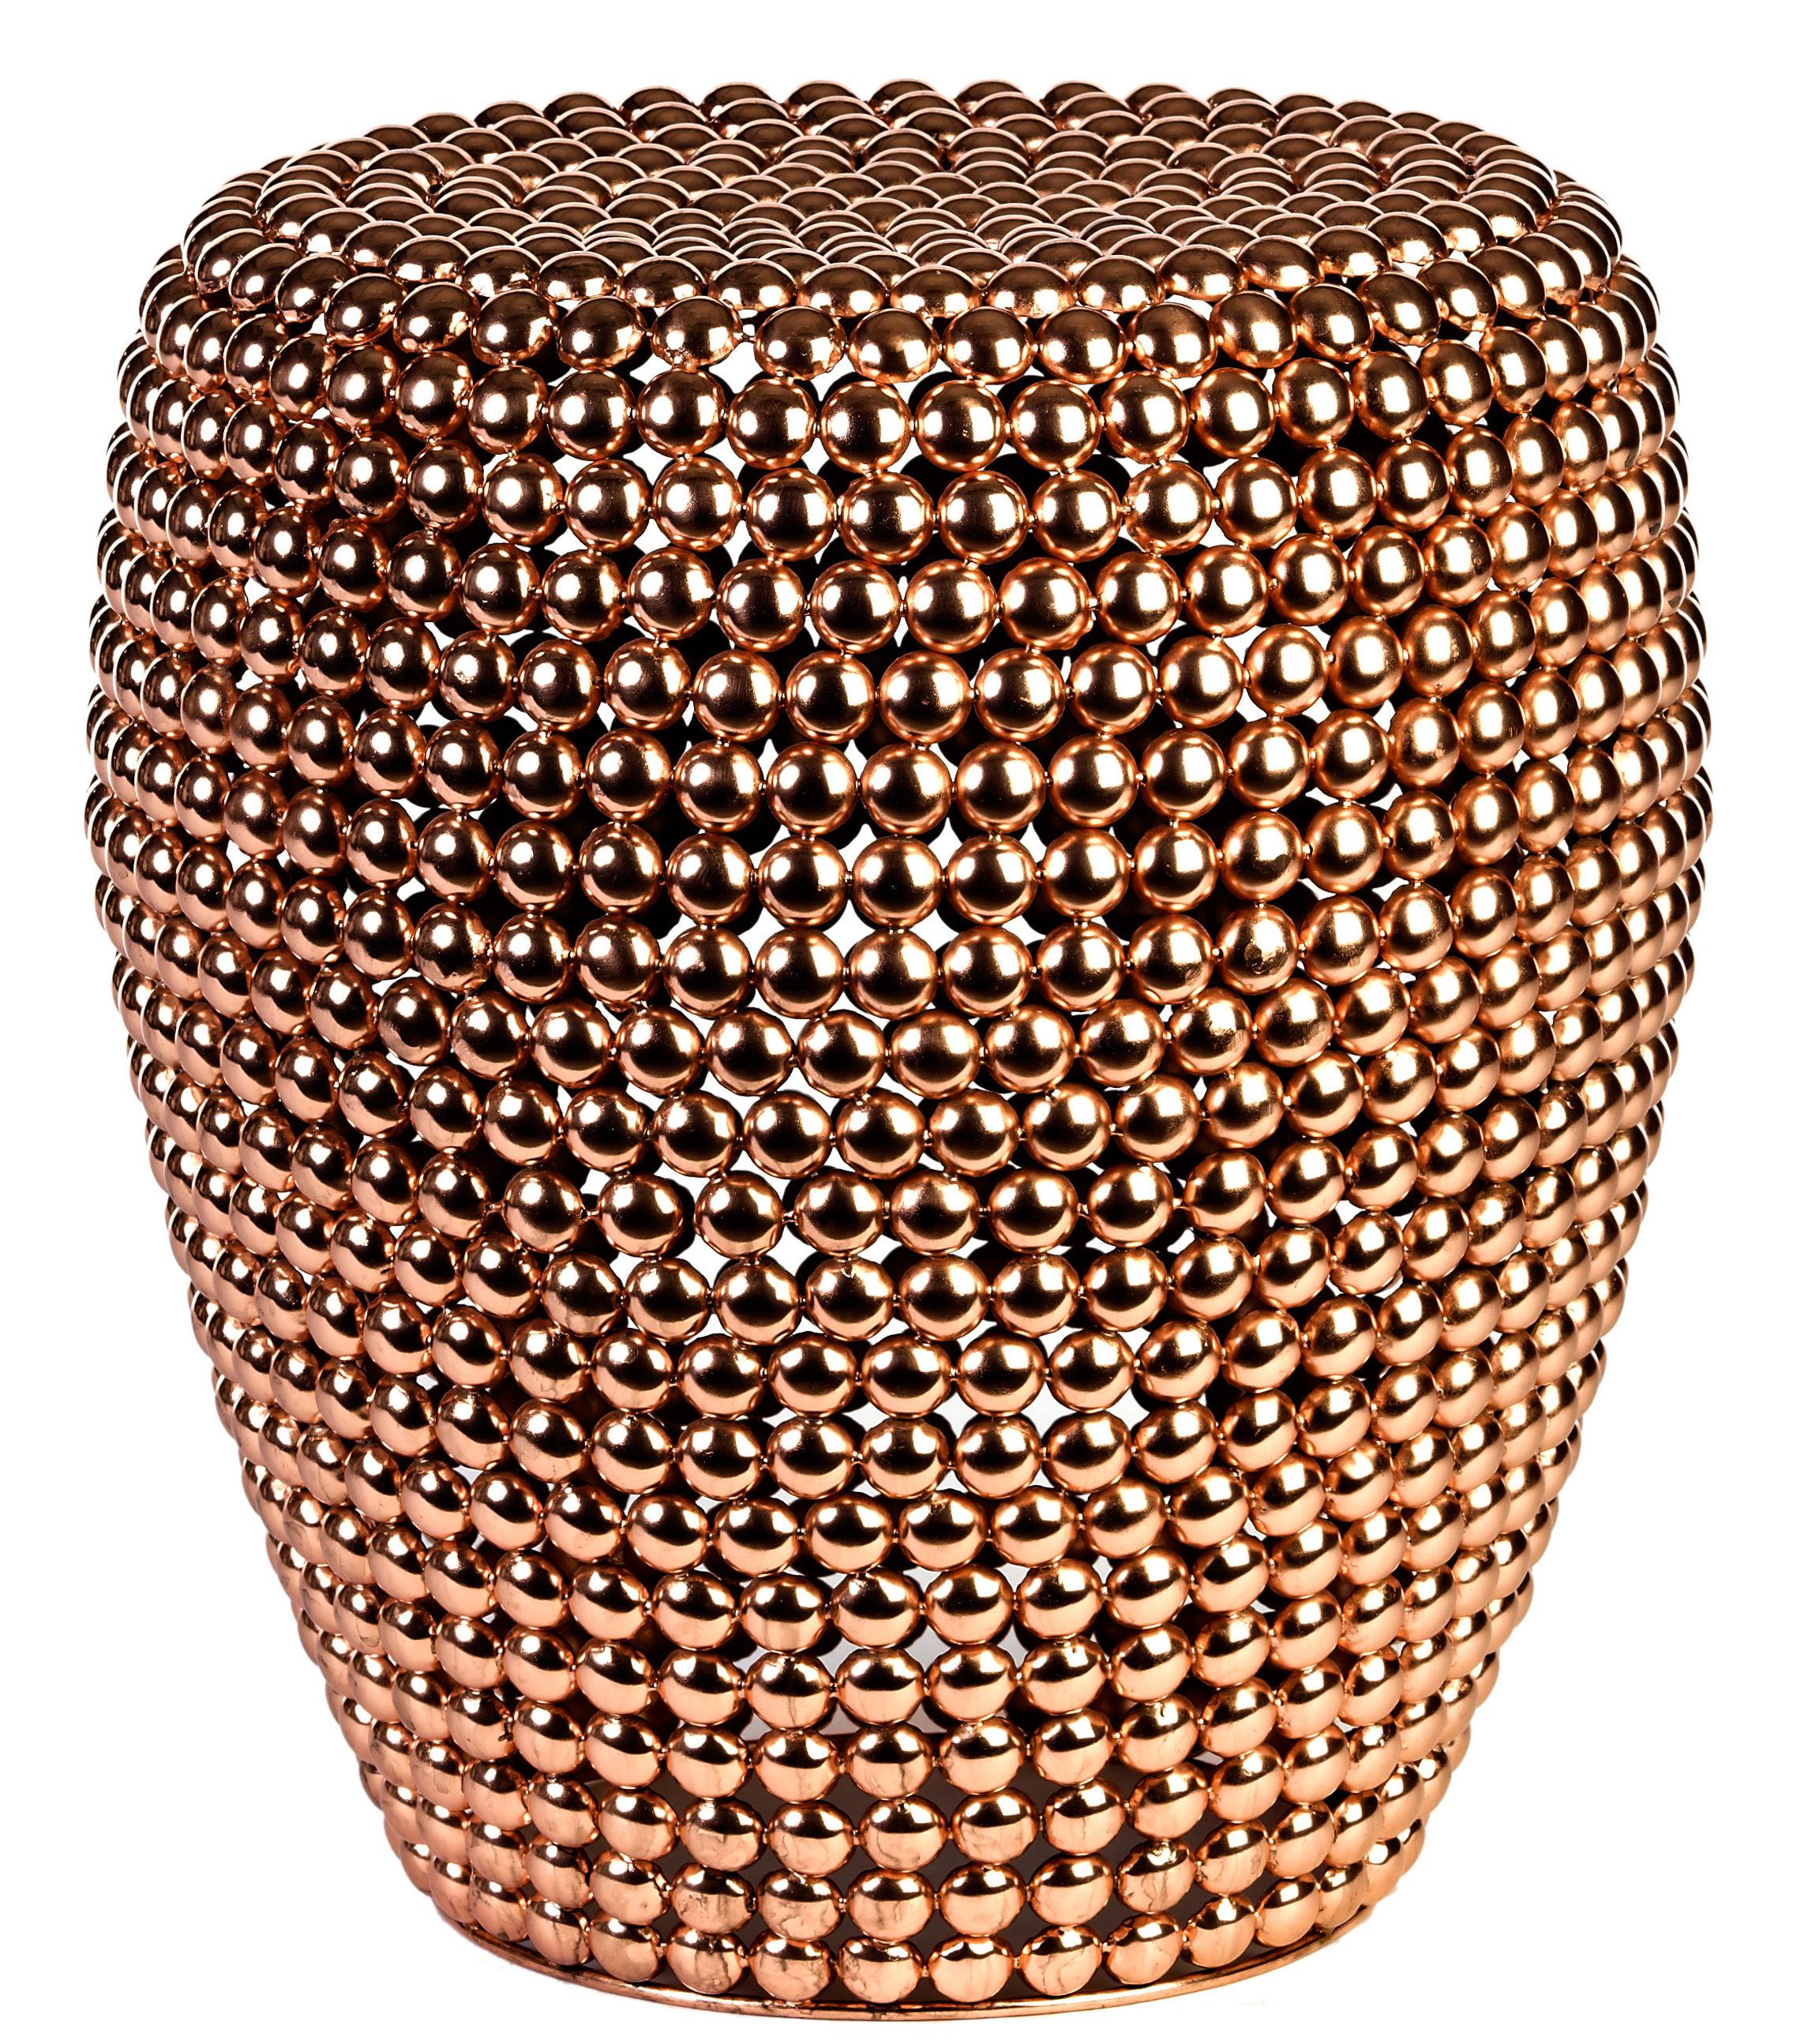 Furniture - Stools - Dot Stool by Pols Potten - Copper - Metal